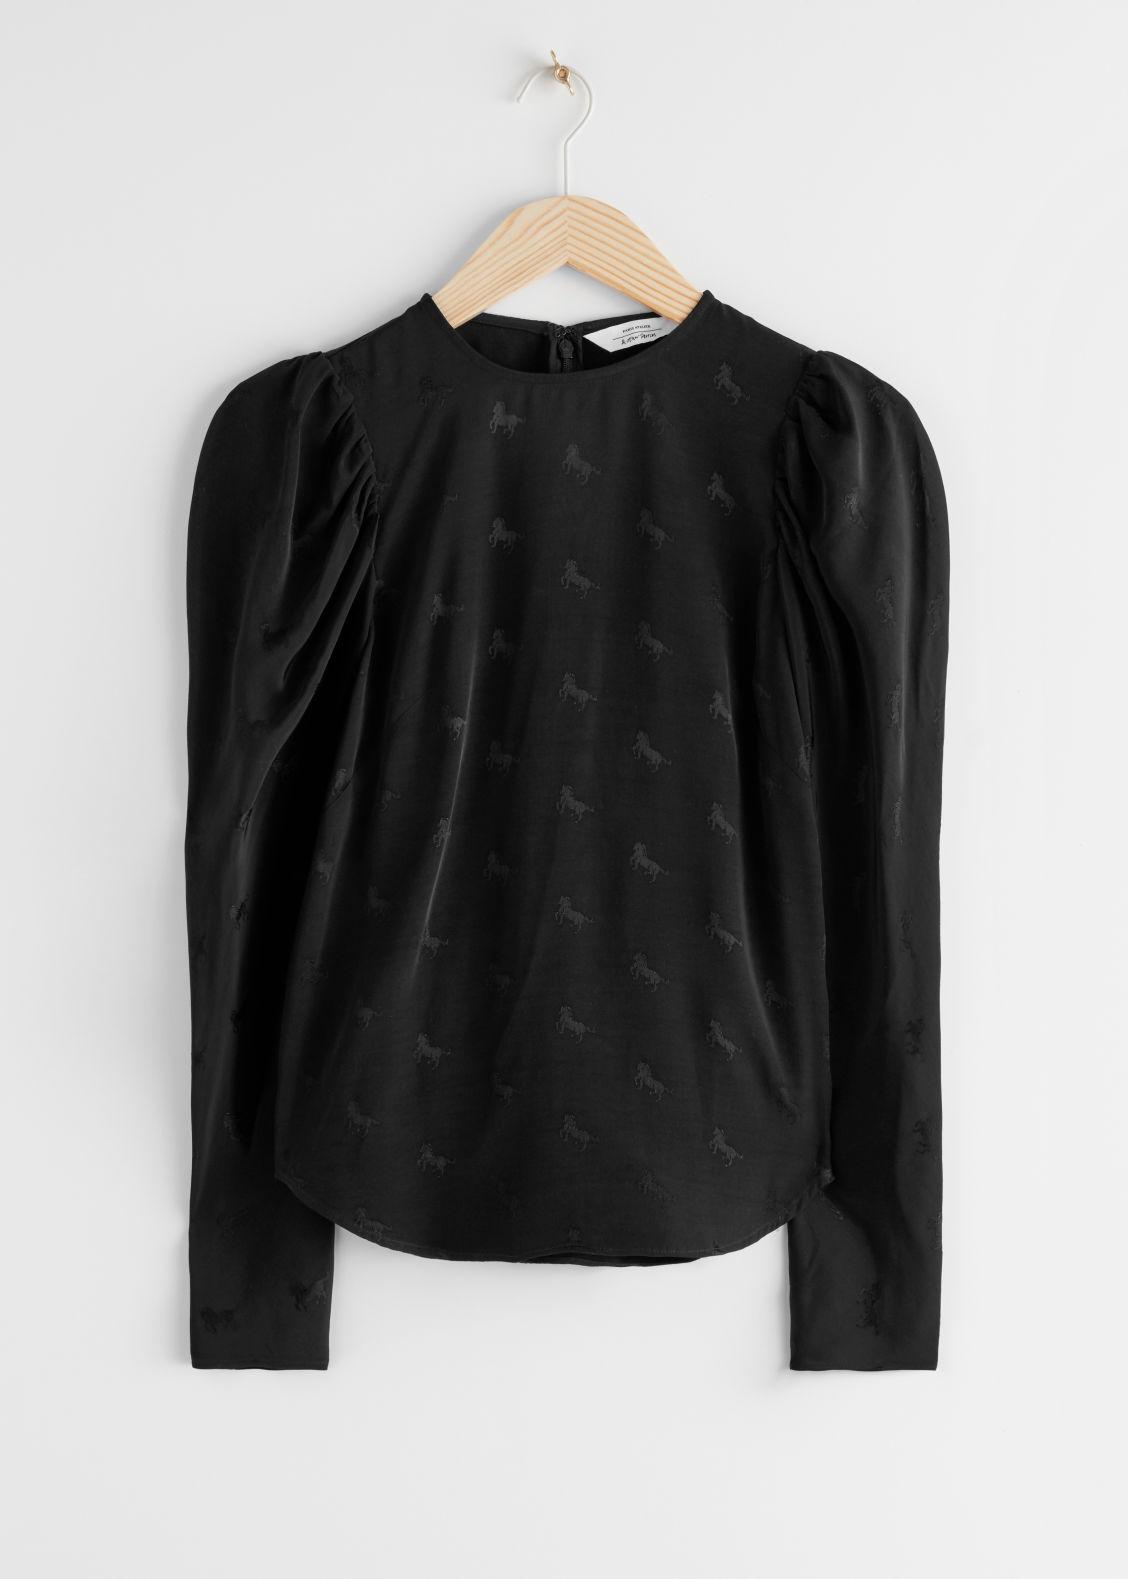 Black jacquard puff sleeve top